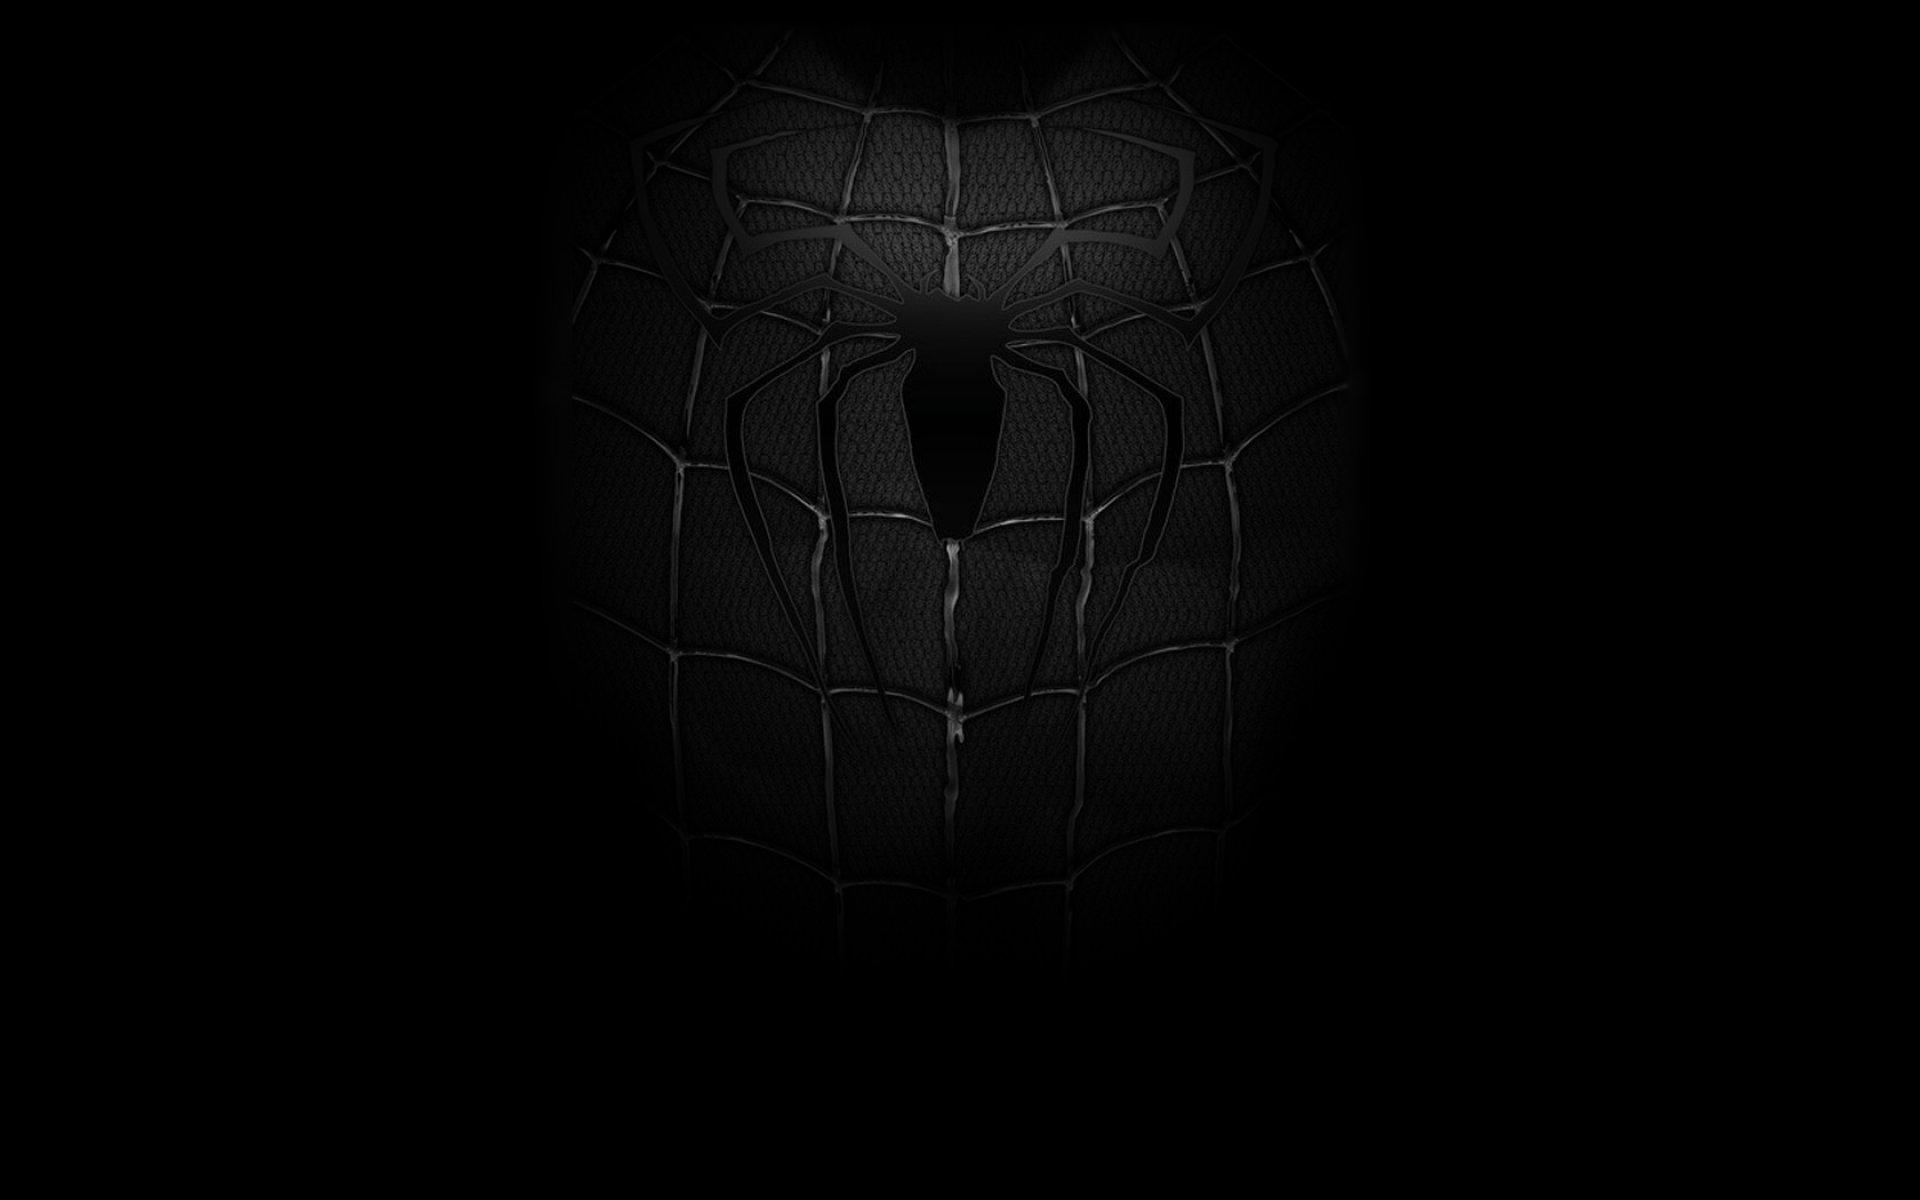 26 Dark Spider Man Wallpapers On Wallpapersafari